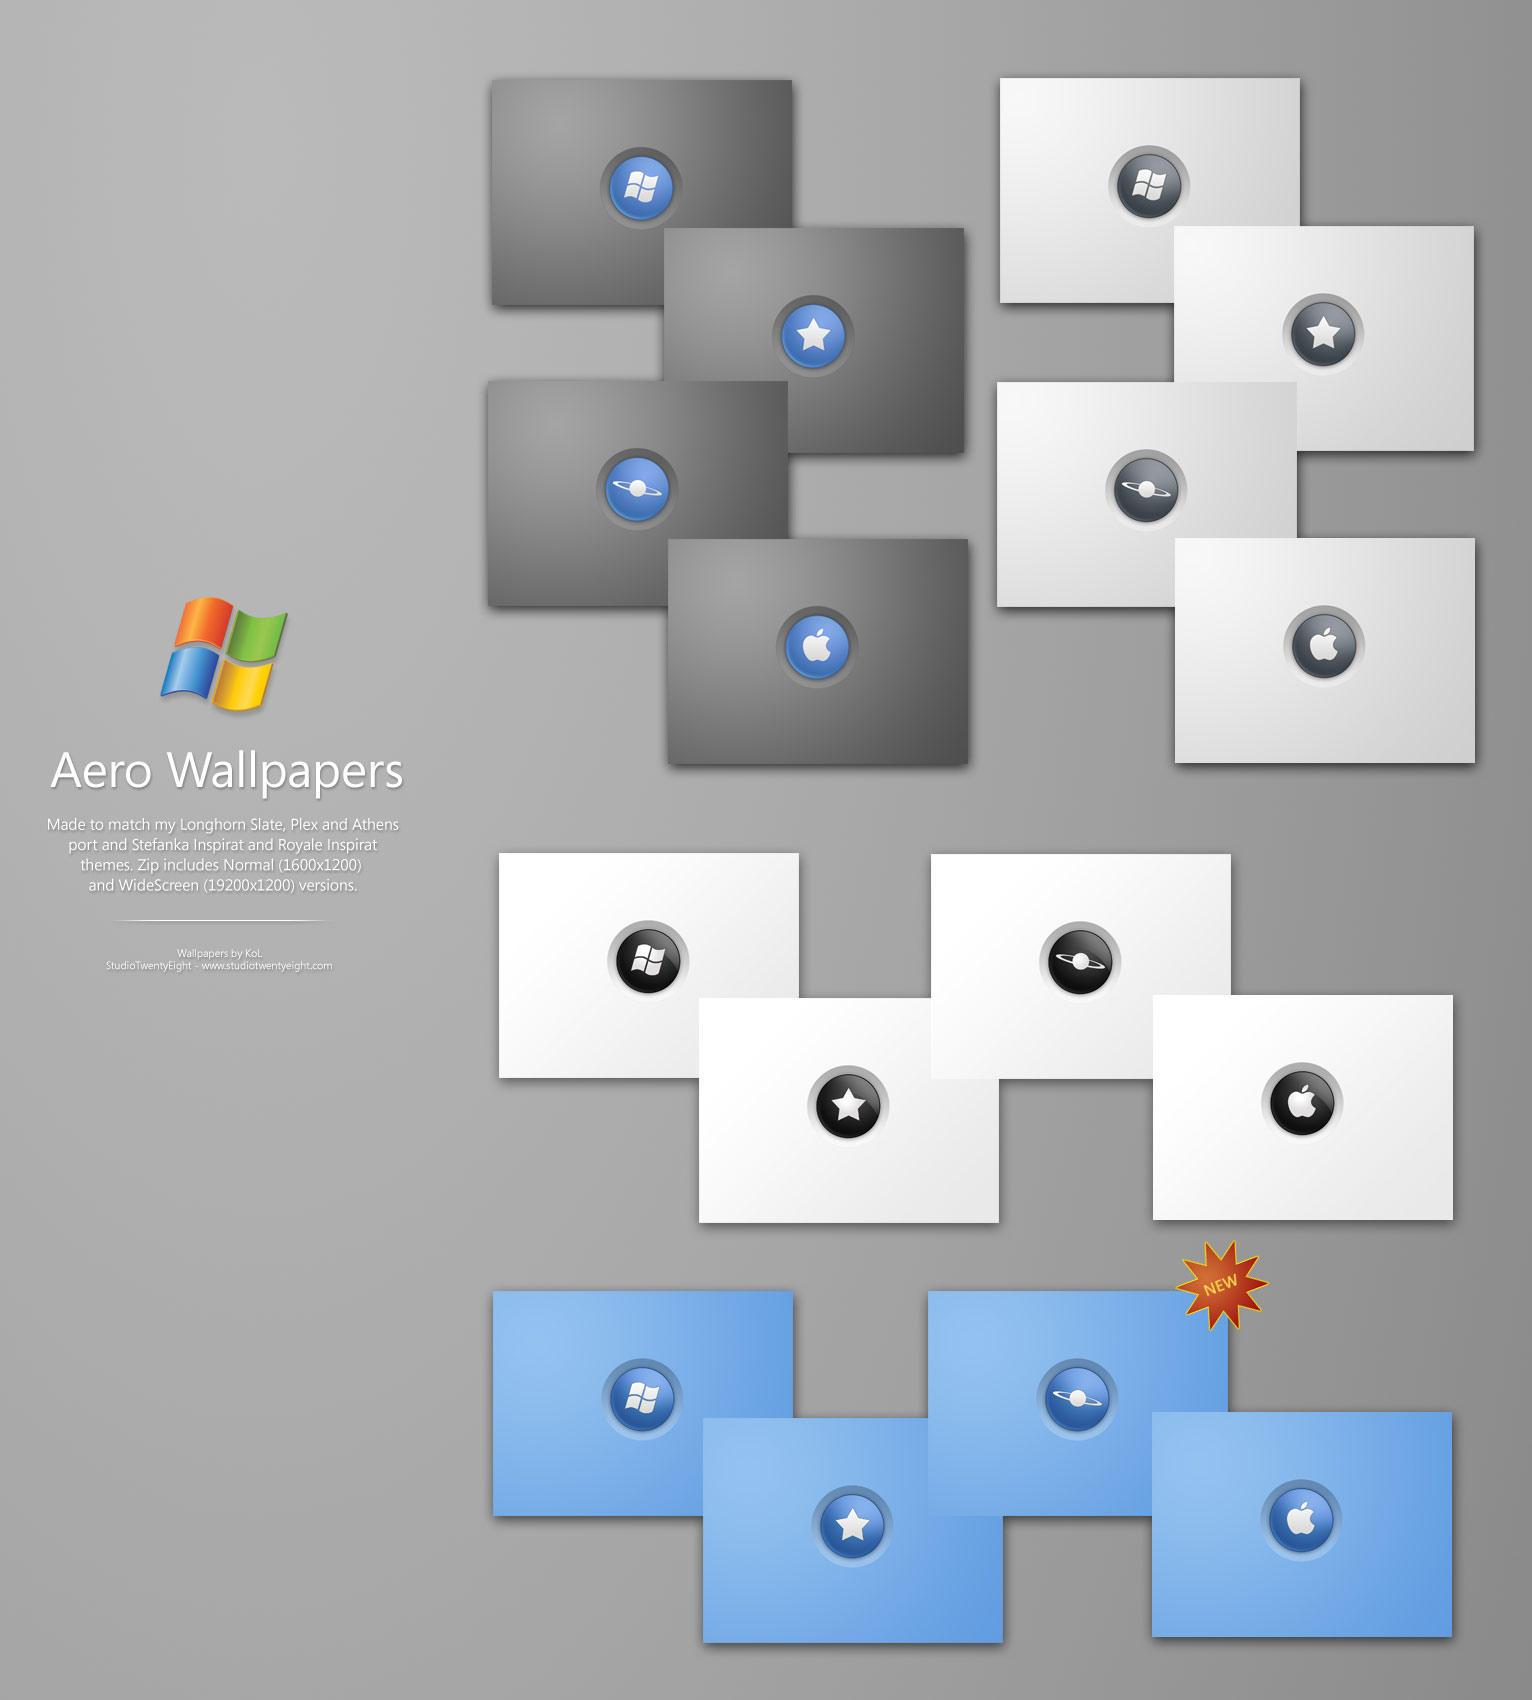 Aero Wallpapers by javierocasio